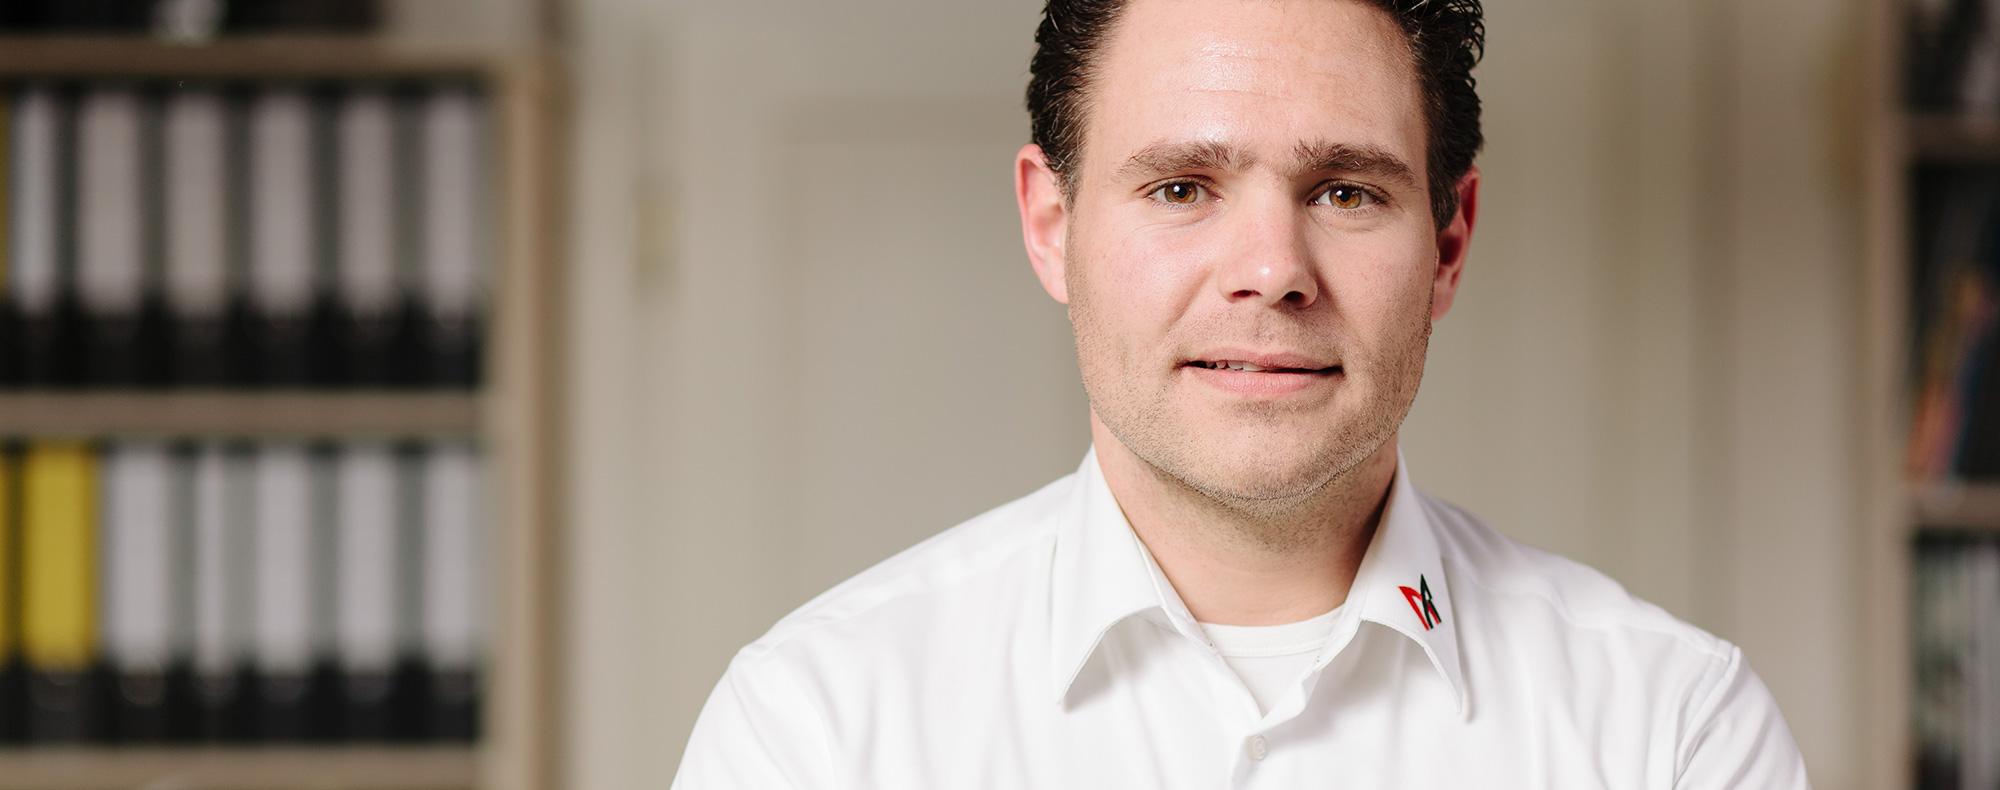 Sebastian Reihsner - Ingenieurbüro Reihsner in Wittlich